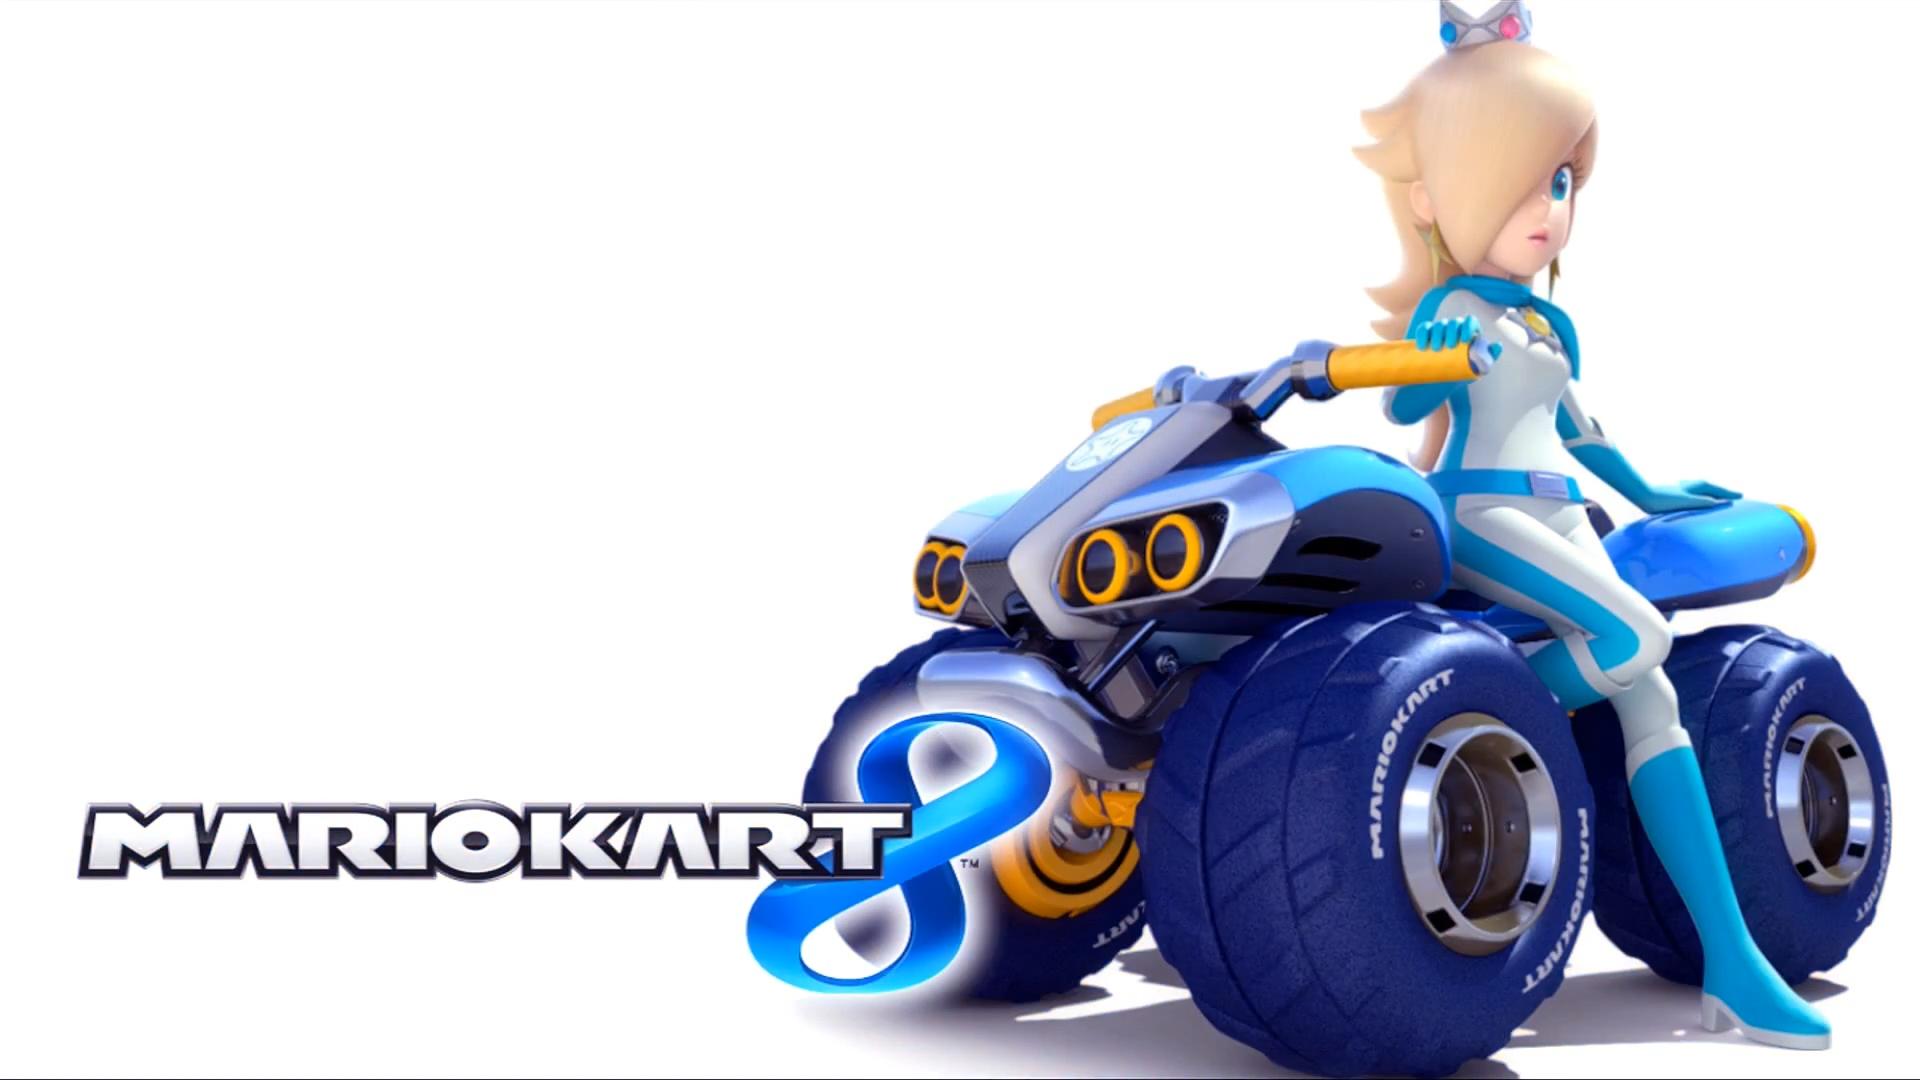 Donkey kong mario kart wii car tuning - Mario Kart 8